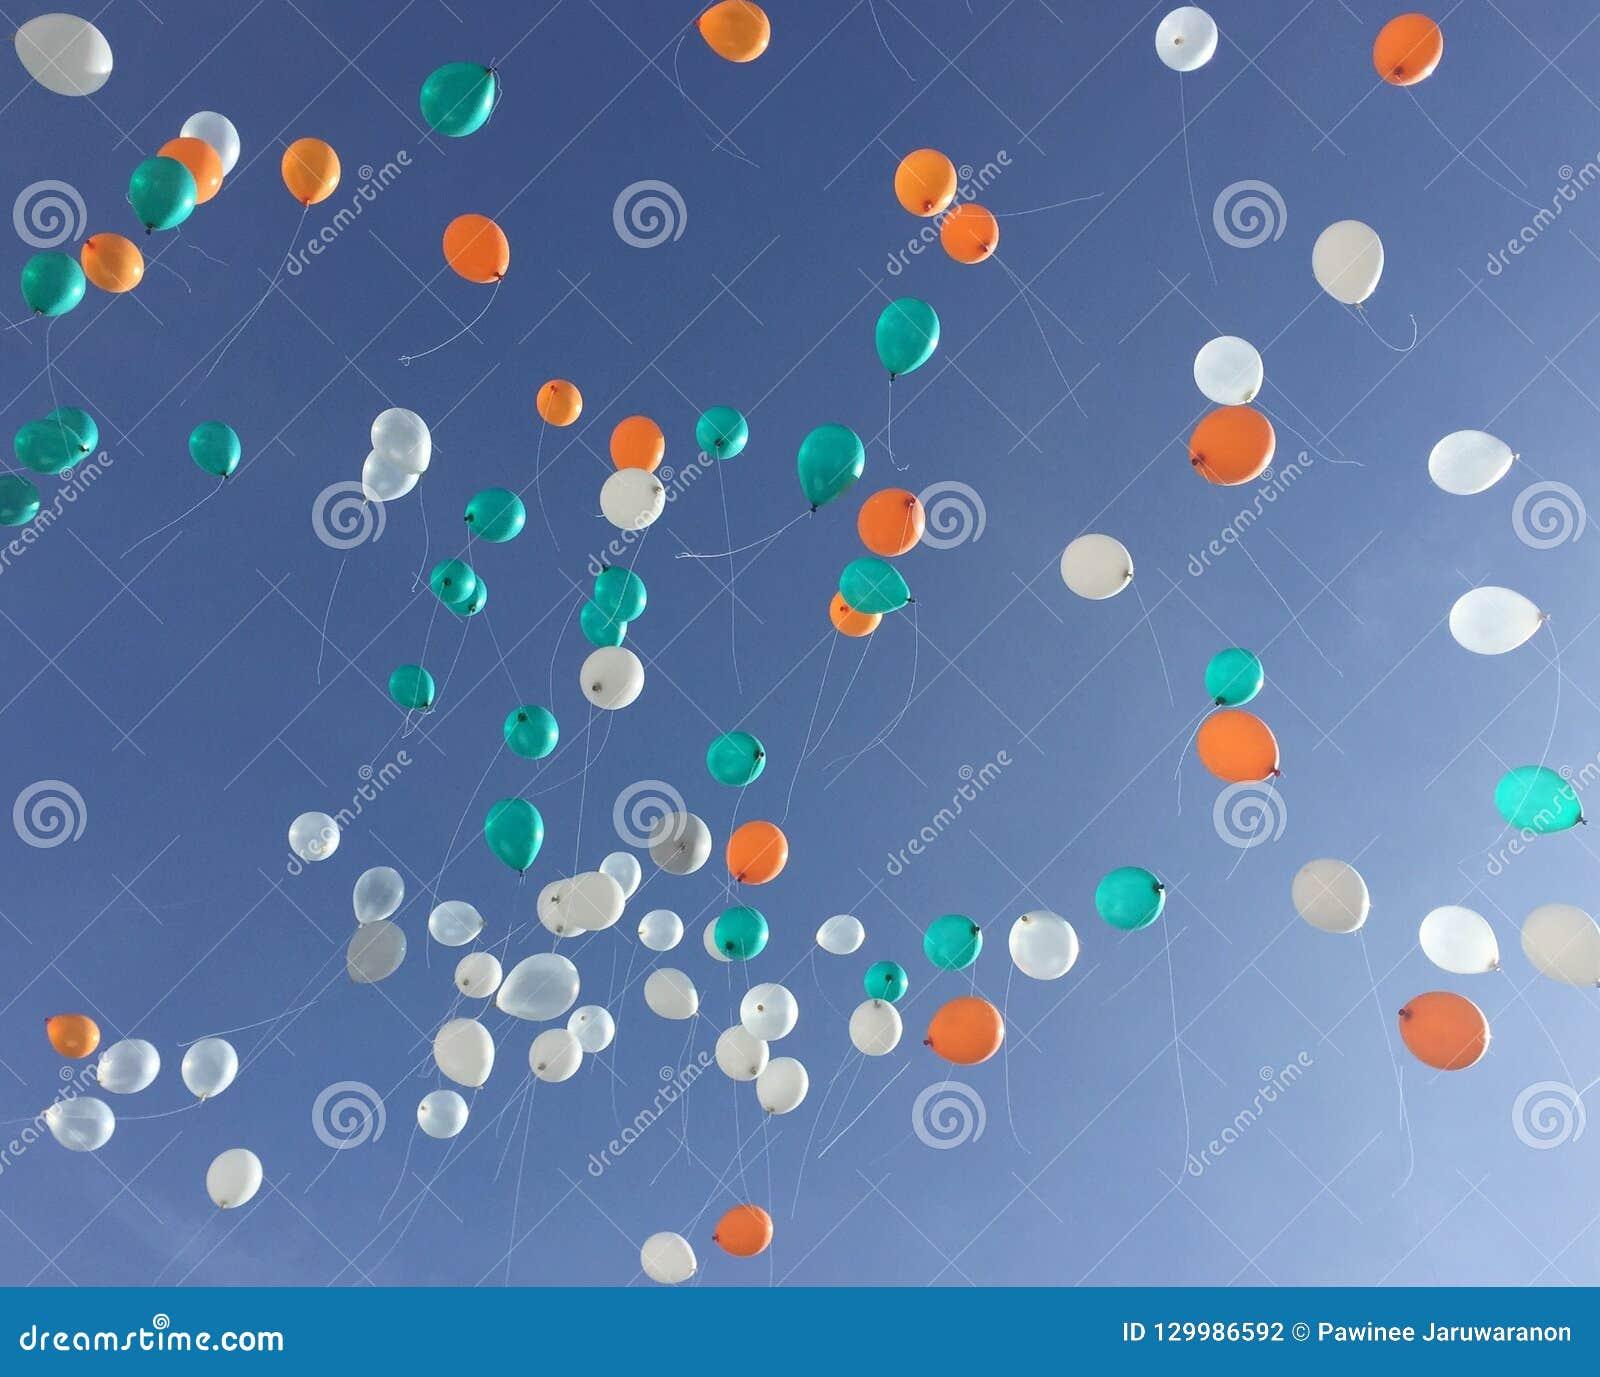 Kleurrijke ballonvlotter tot de blauwe hemel